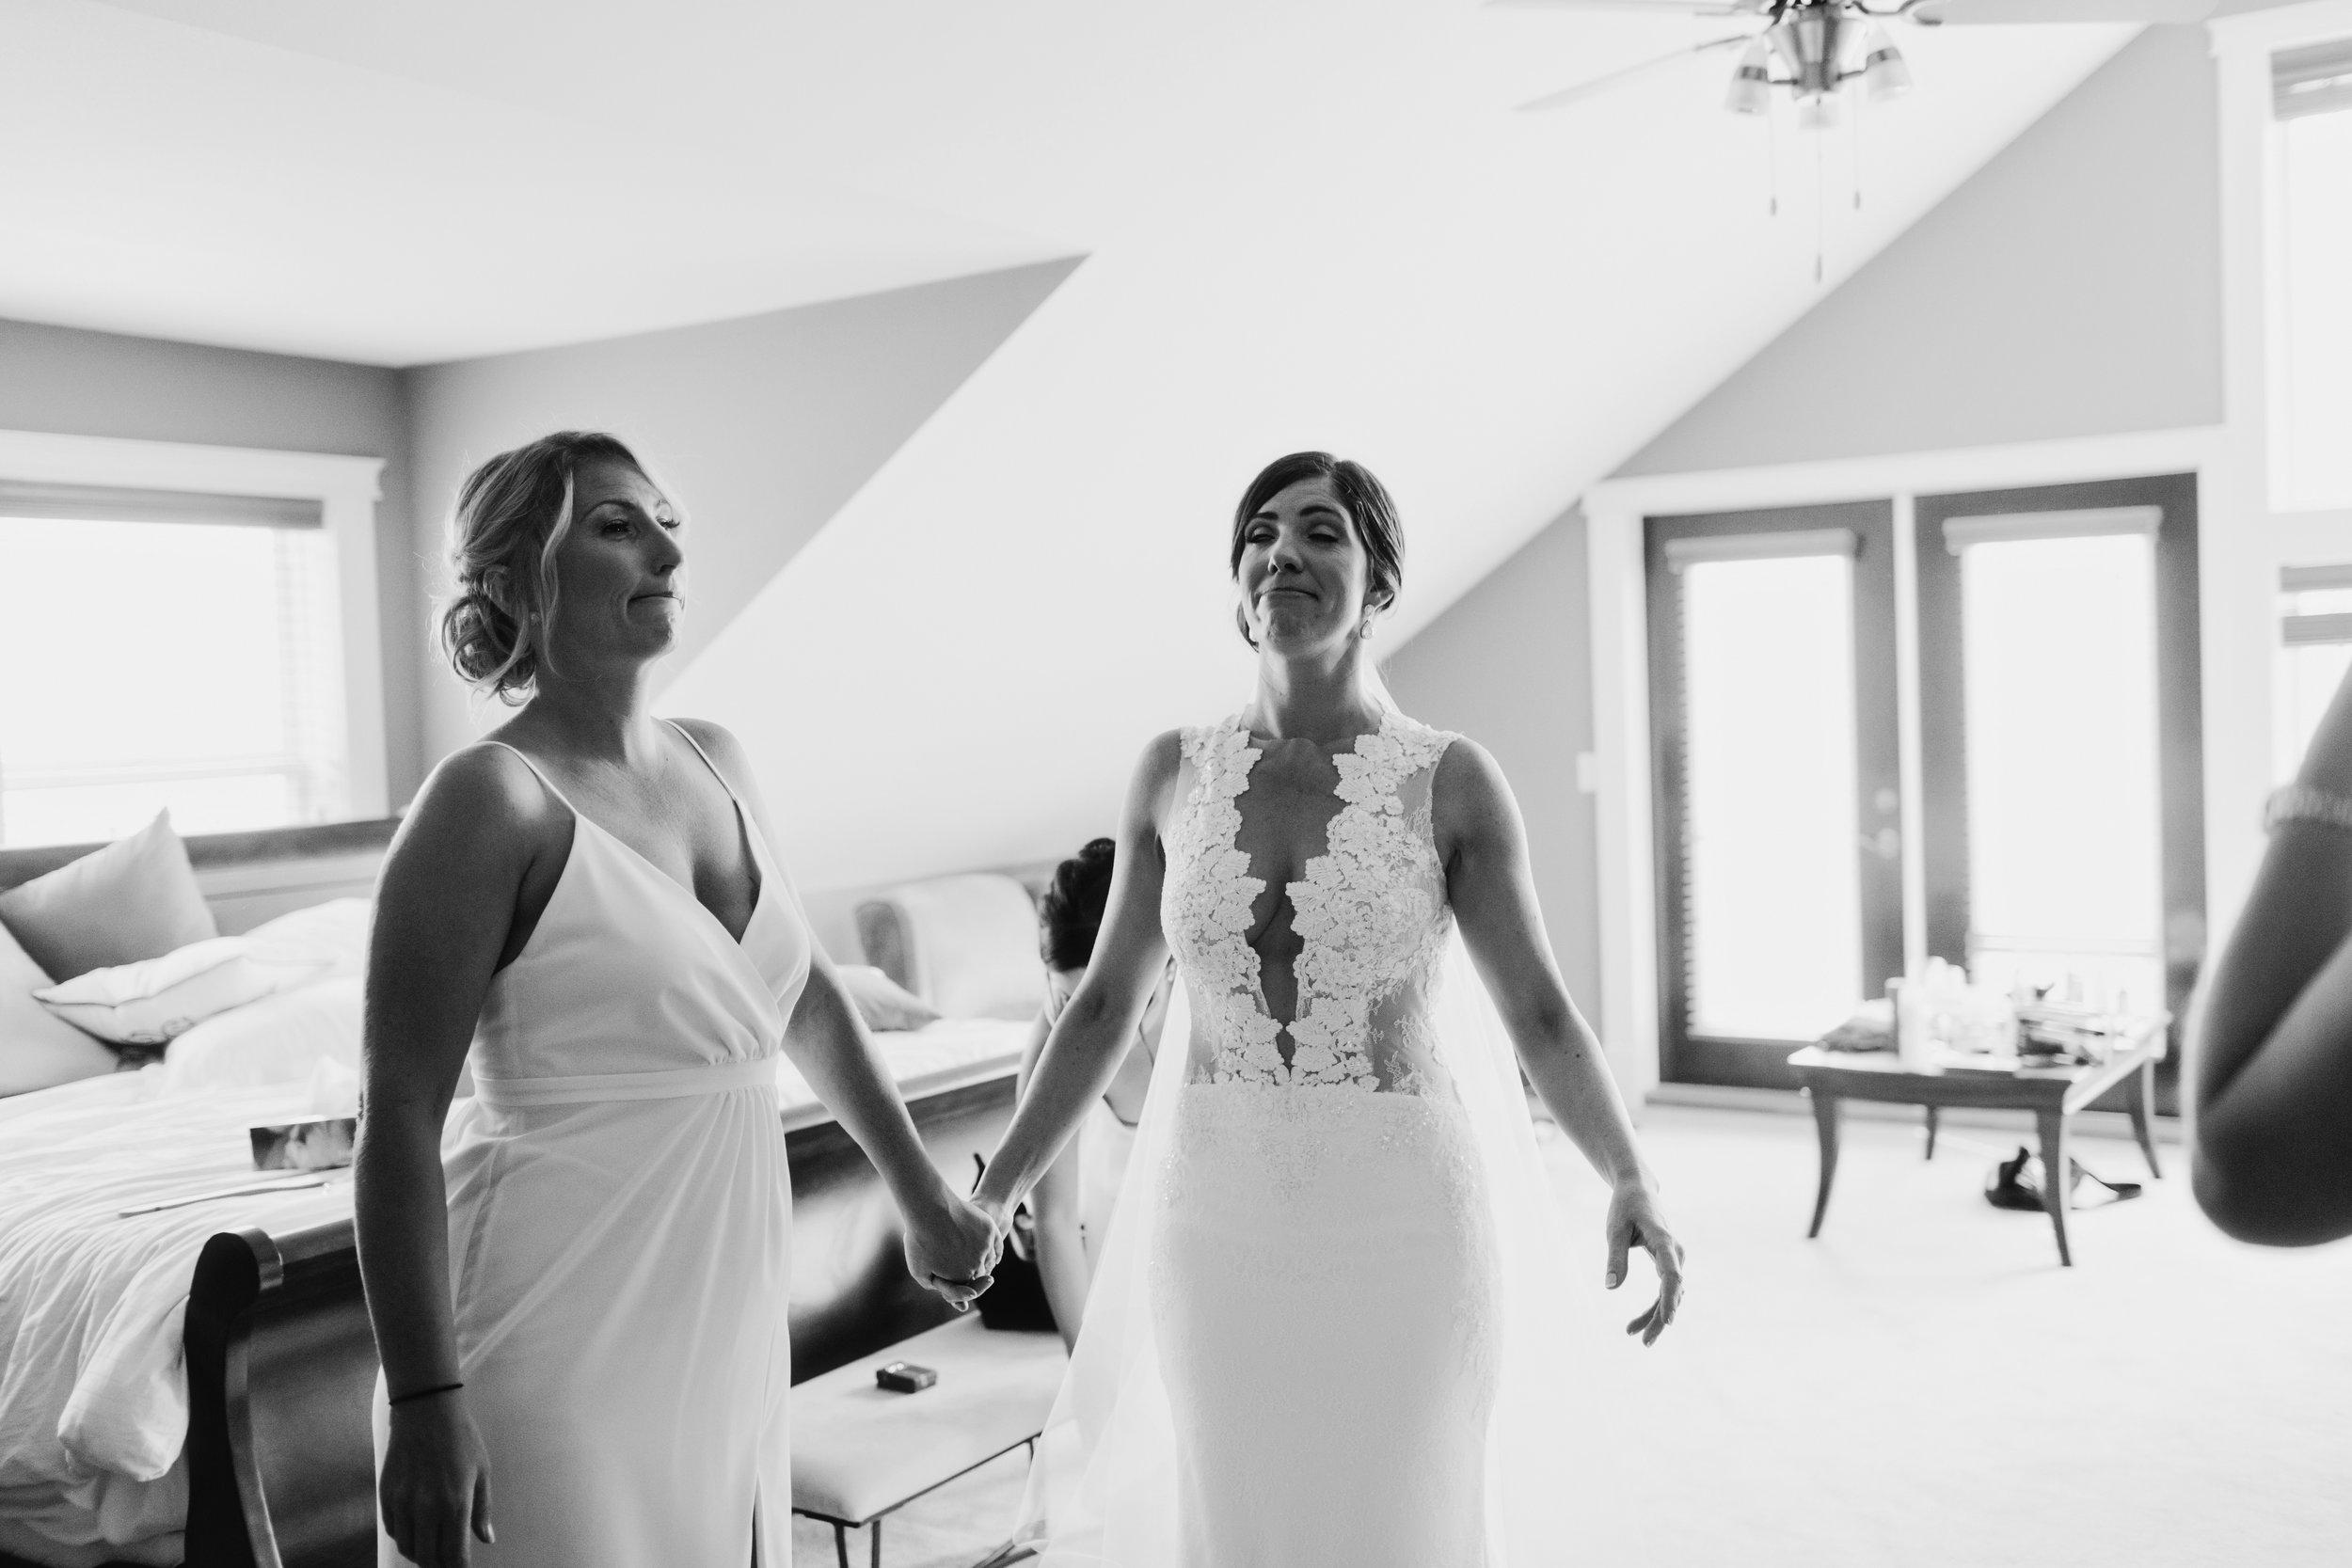 taylor-roades-wedding-0050.JPG